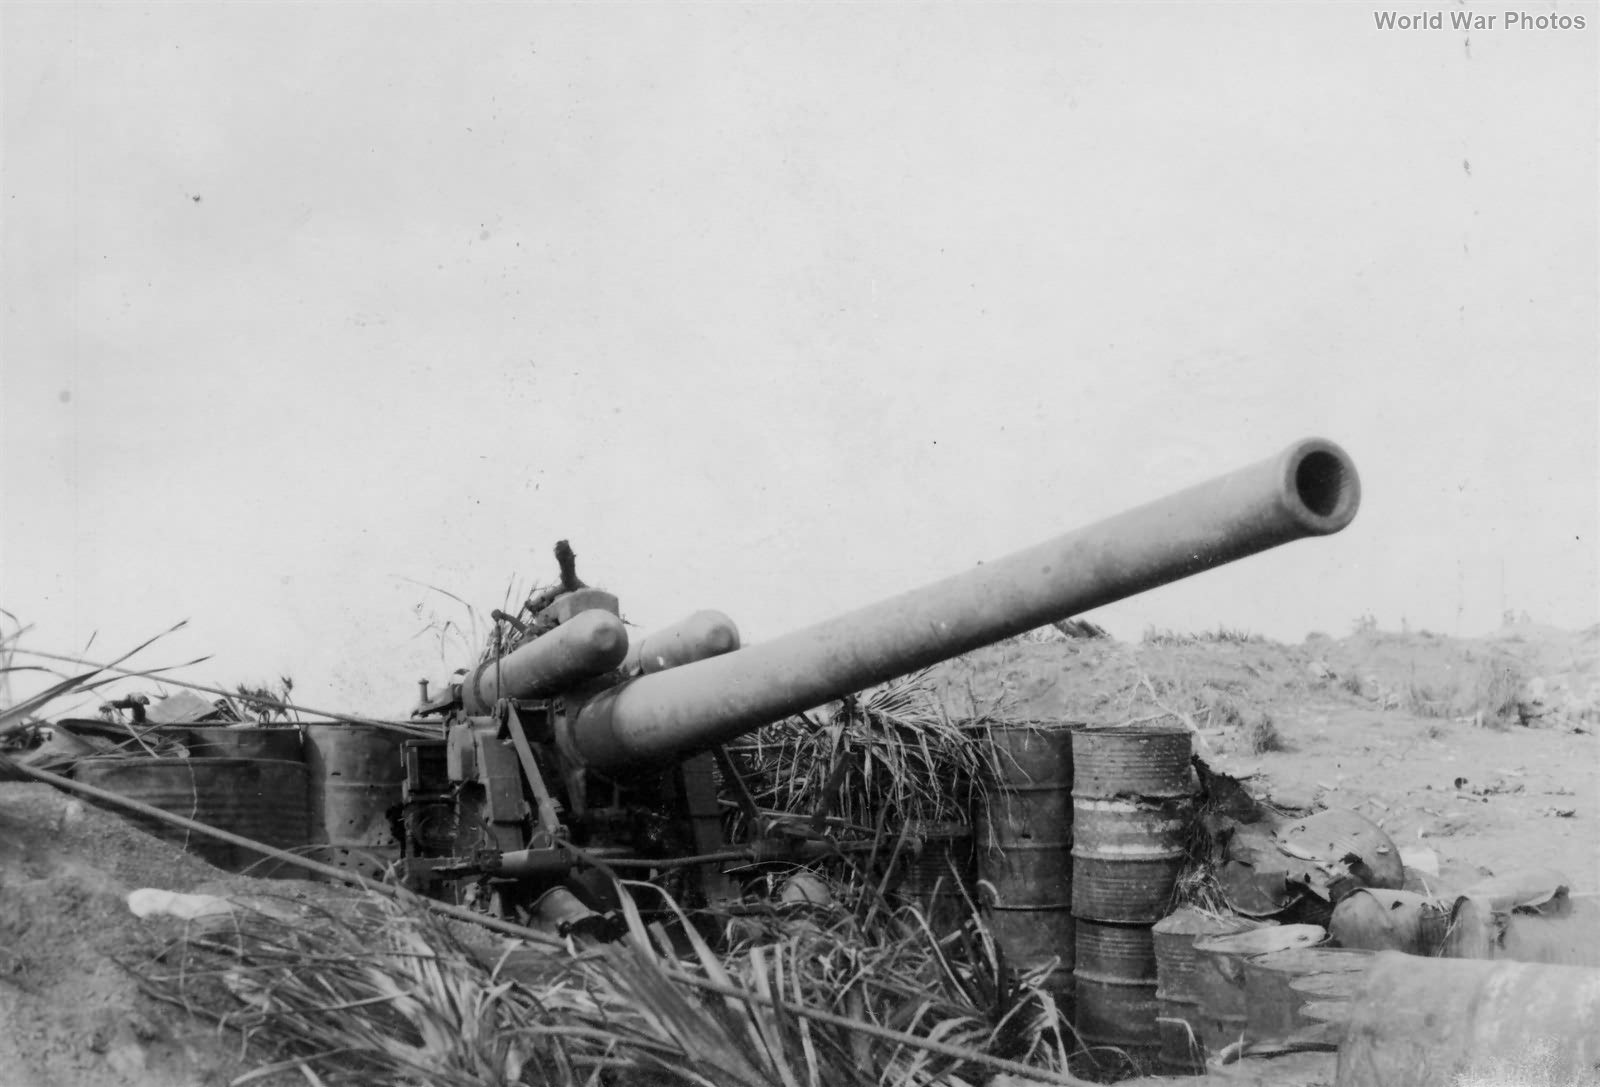 Japanese 12 inch gun